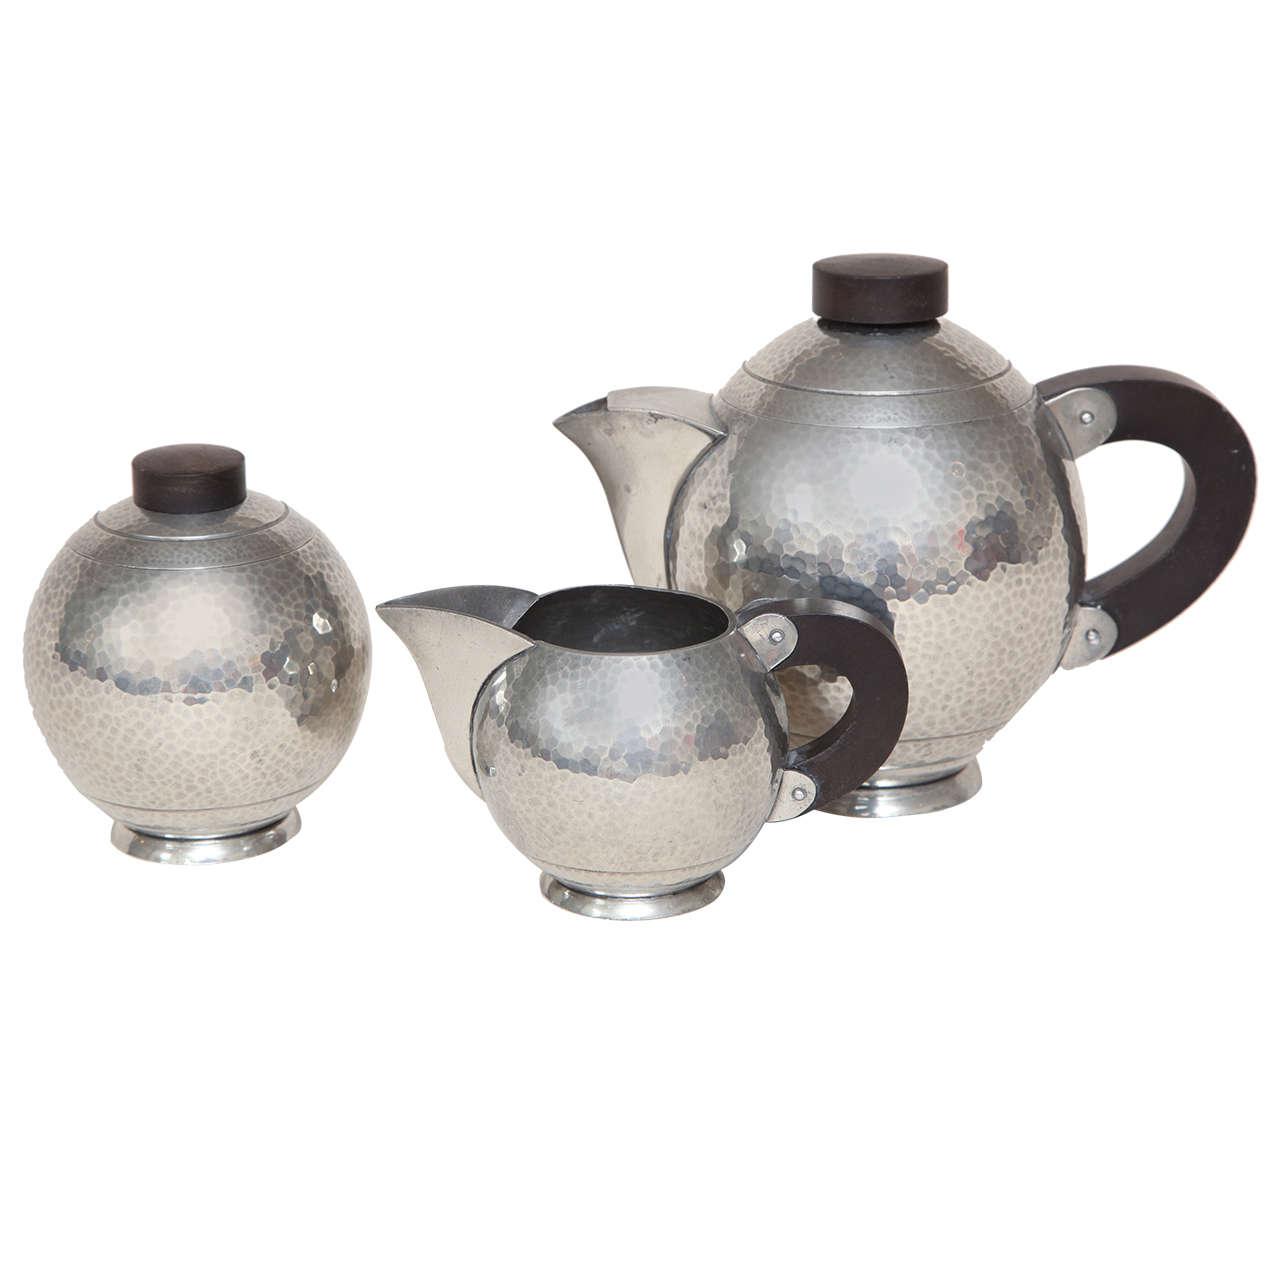 Rene Delavan French Art Deco Maillechort and Wood Three-Piece Tea Service